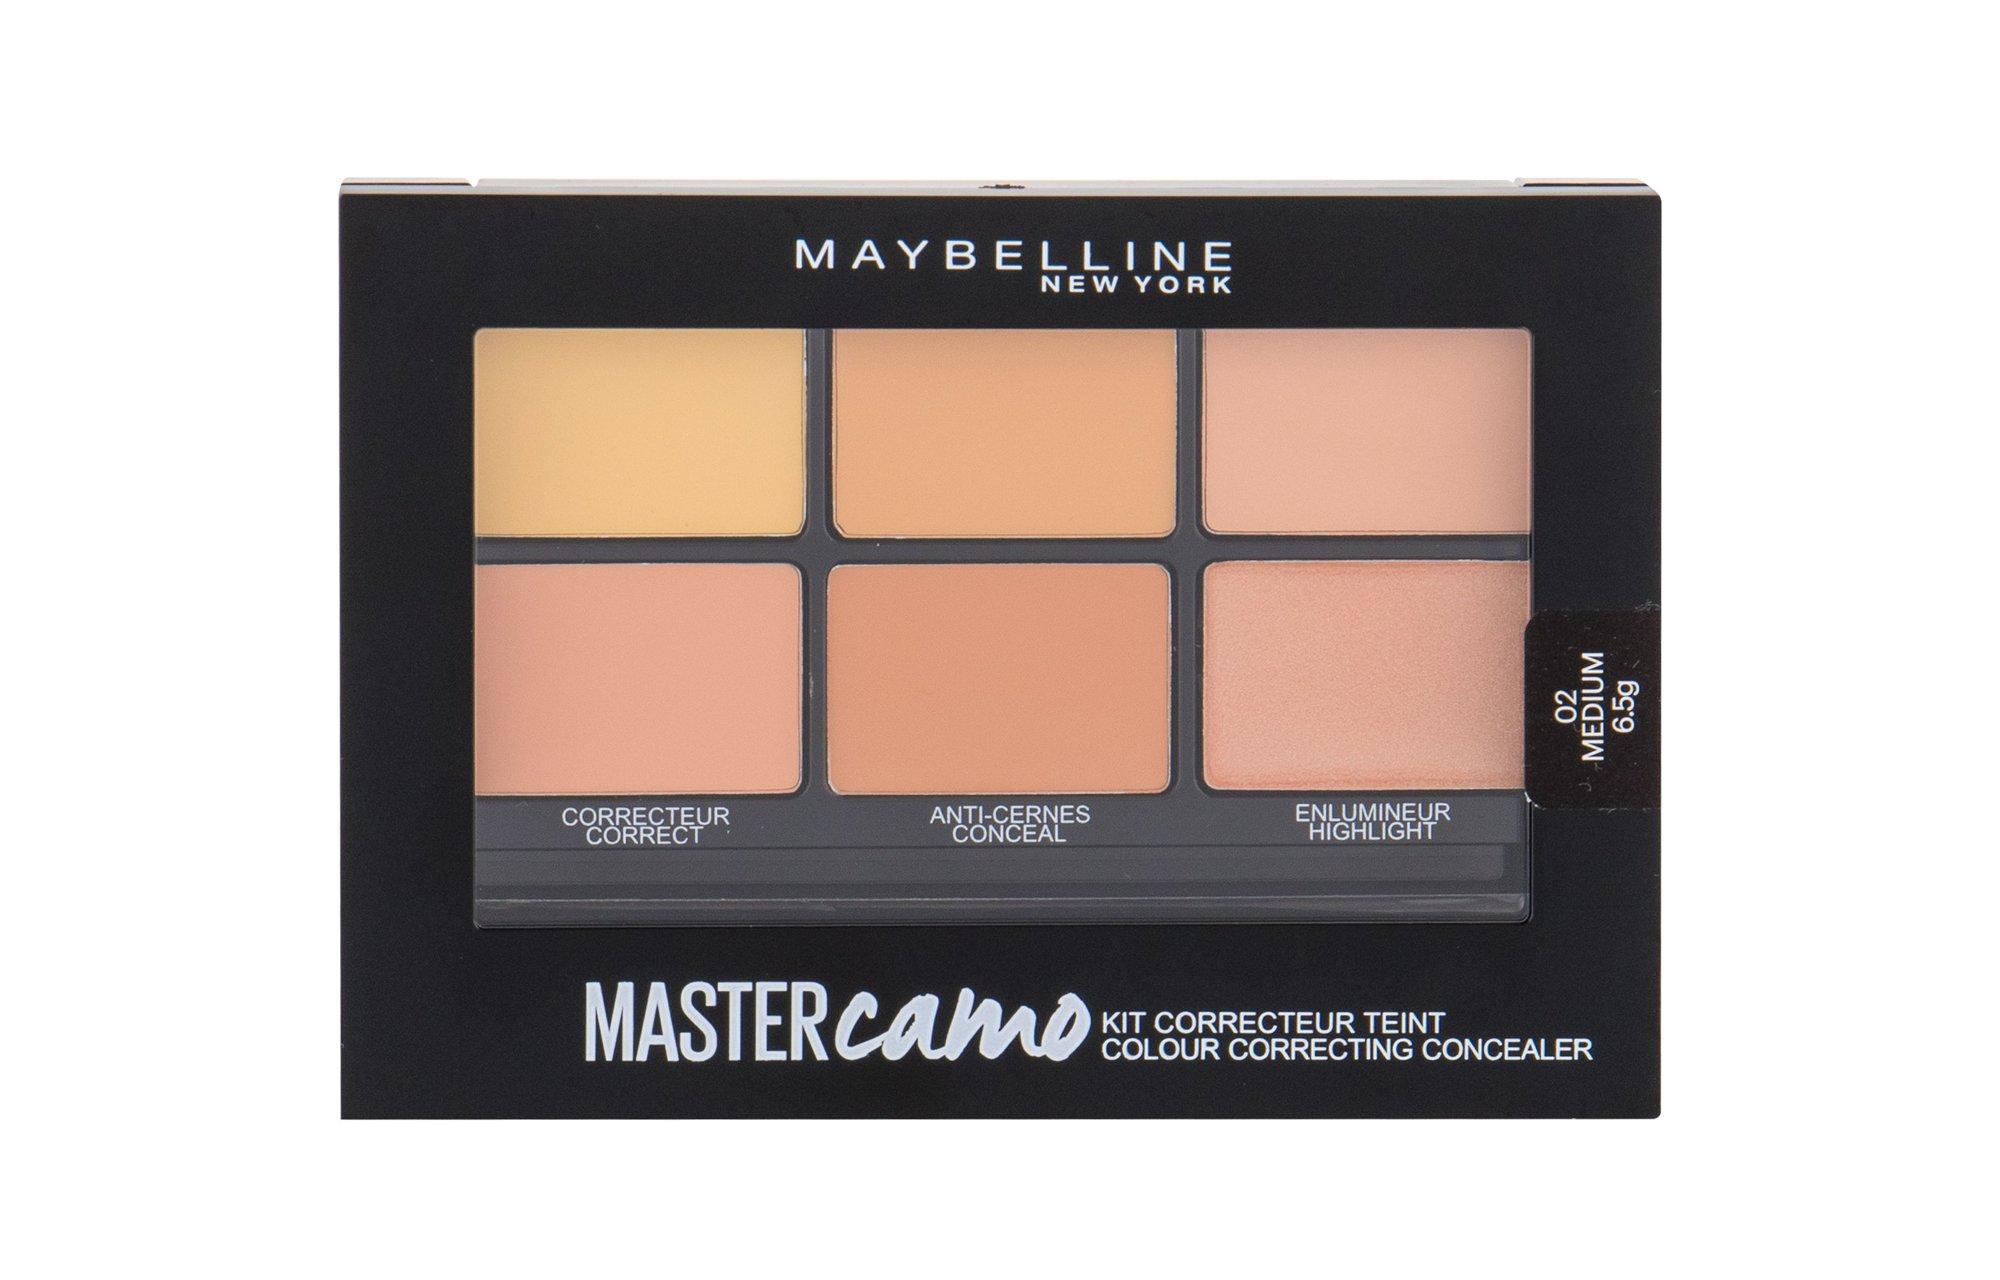 Maybelline Master Camo Corrector 6,5ml 02 Medium